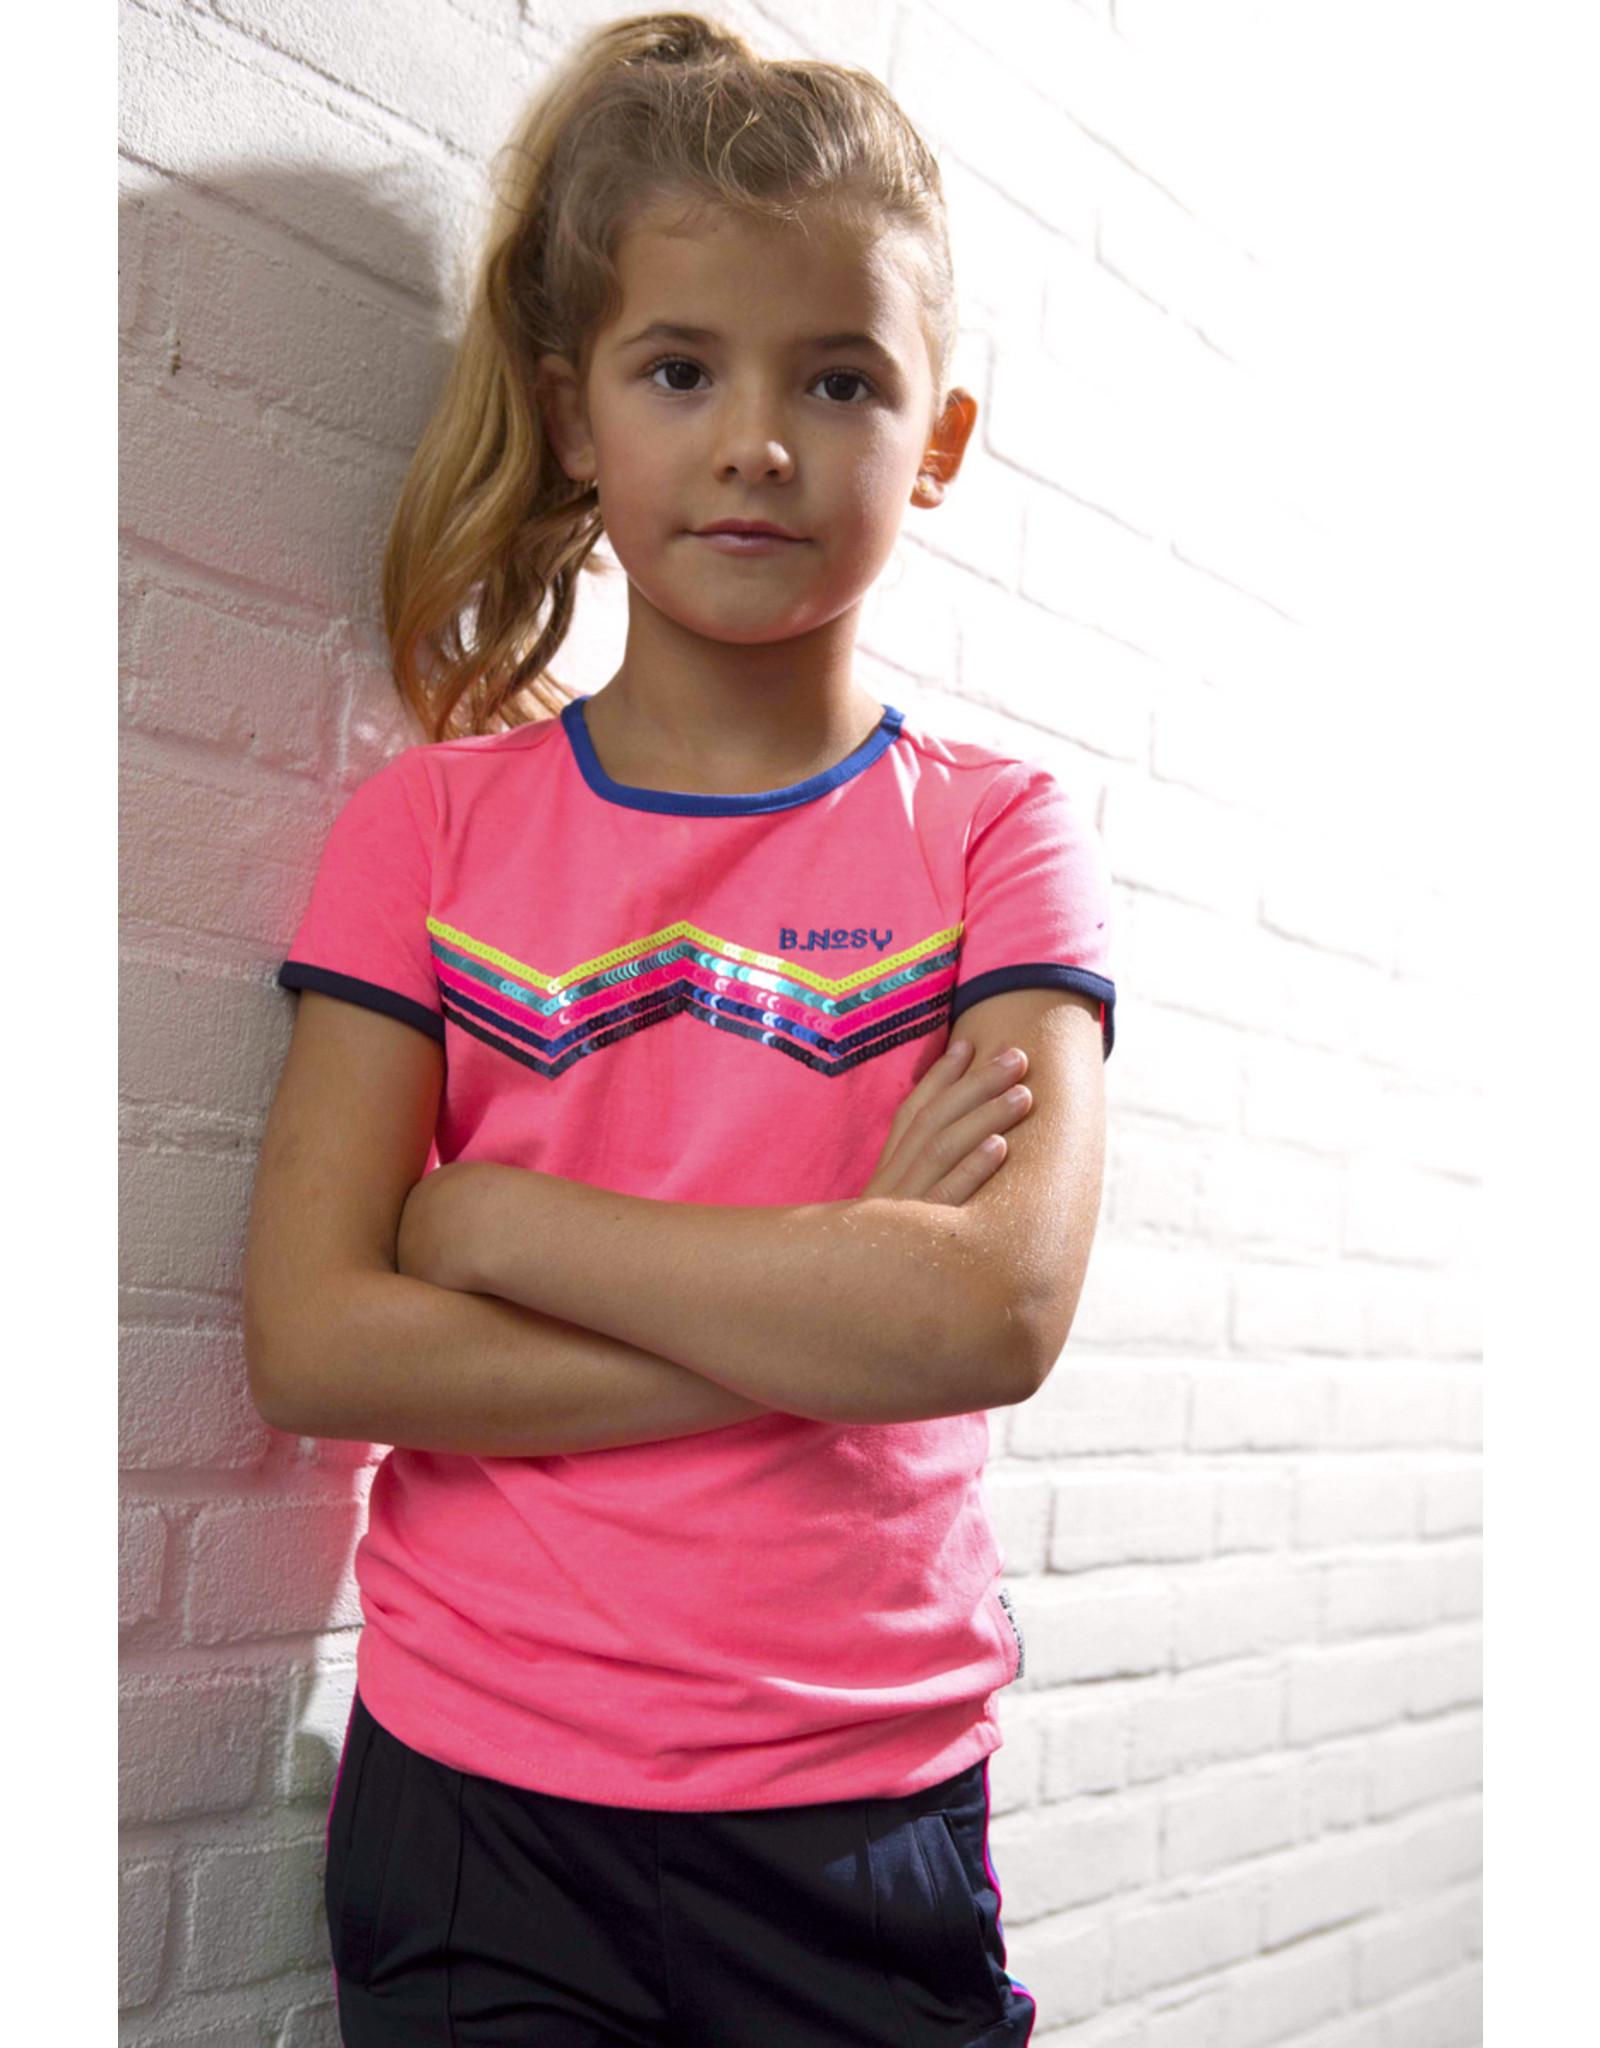 B.Nosy B.Nosy Girls Uni Shirt with zigzag artwork Festival Pink